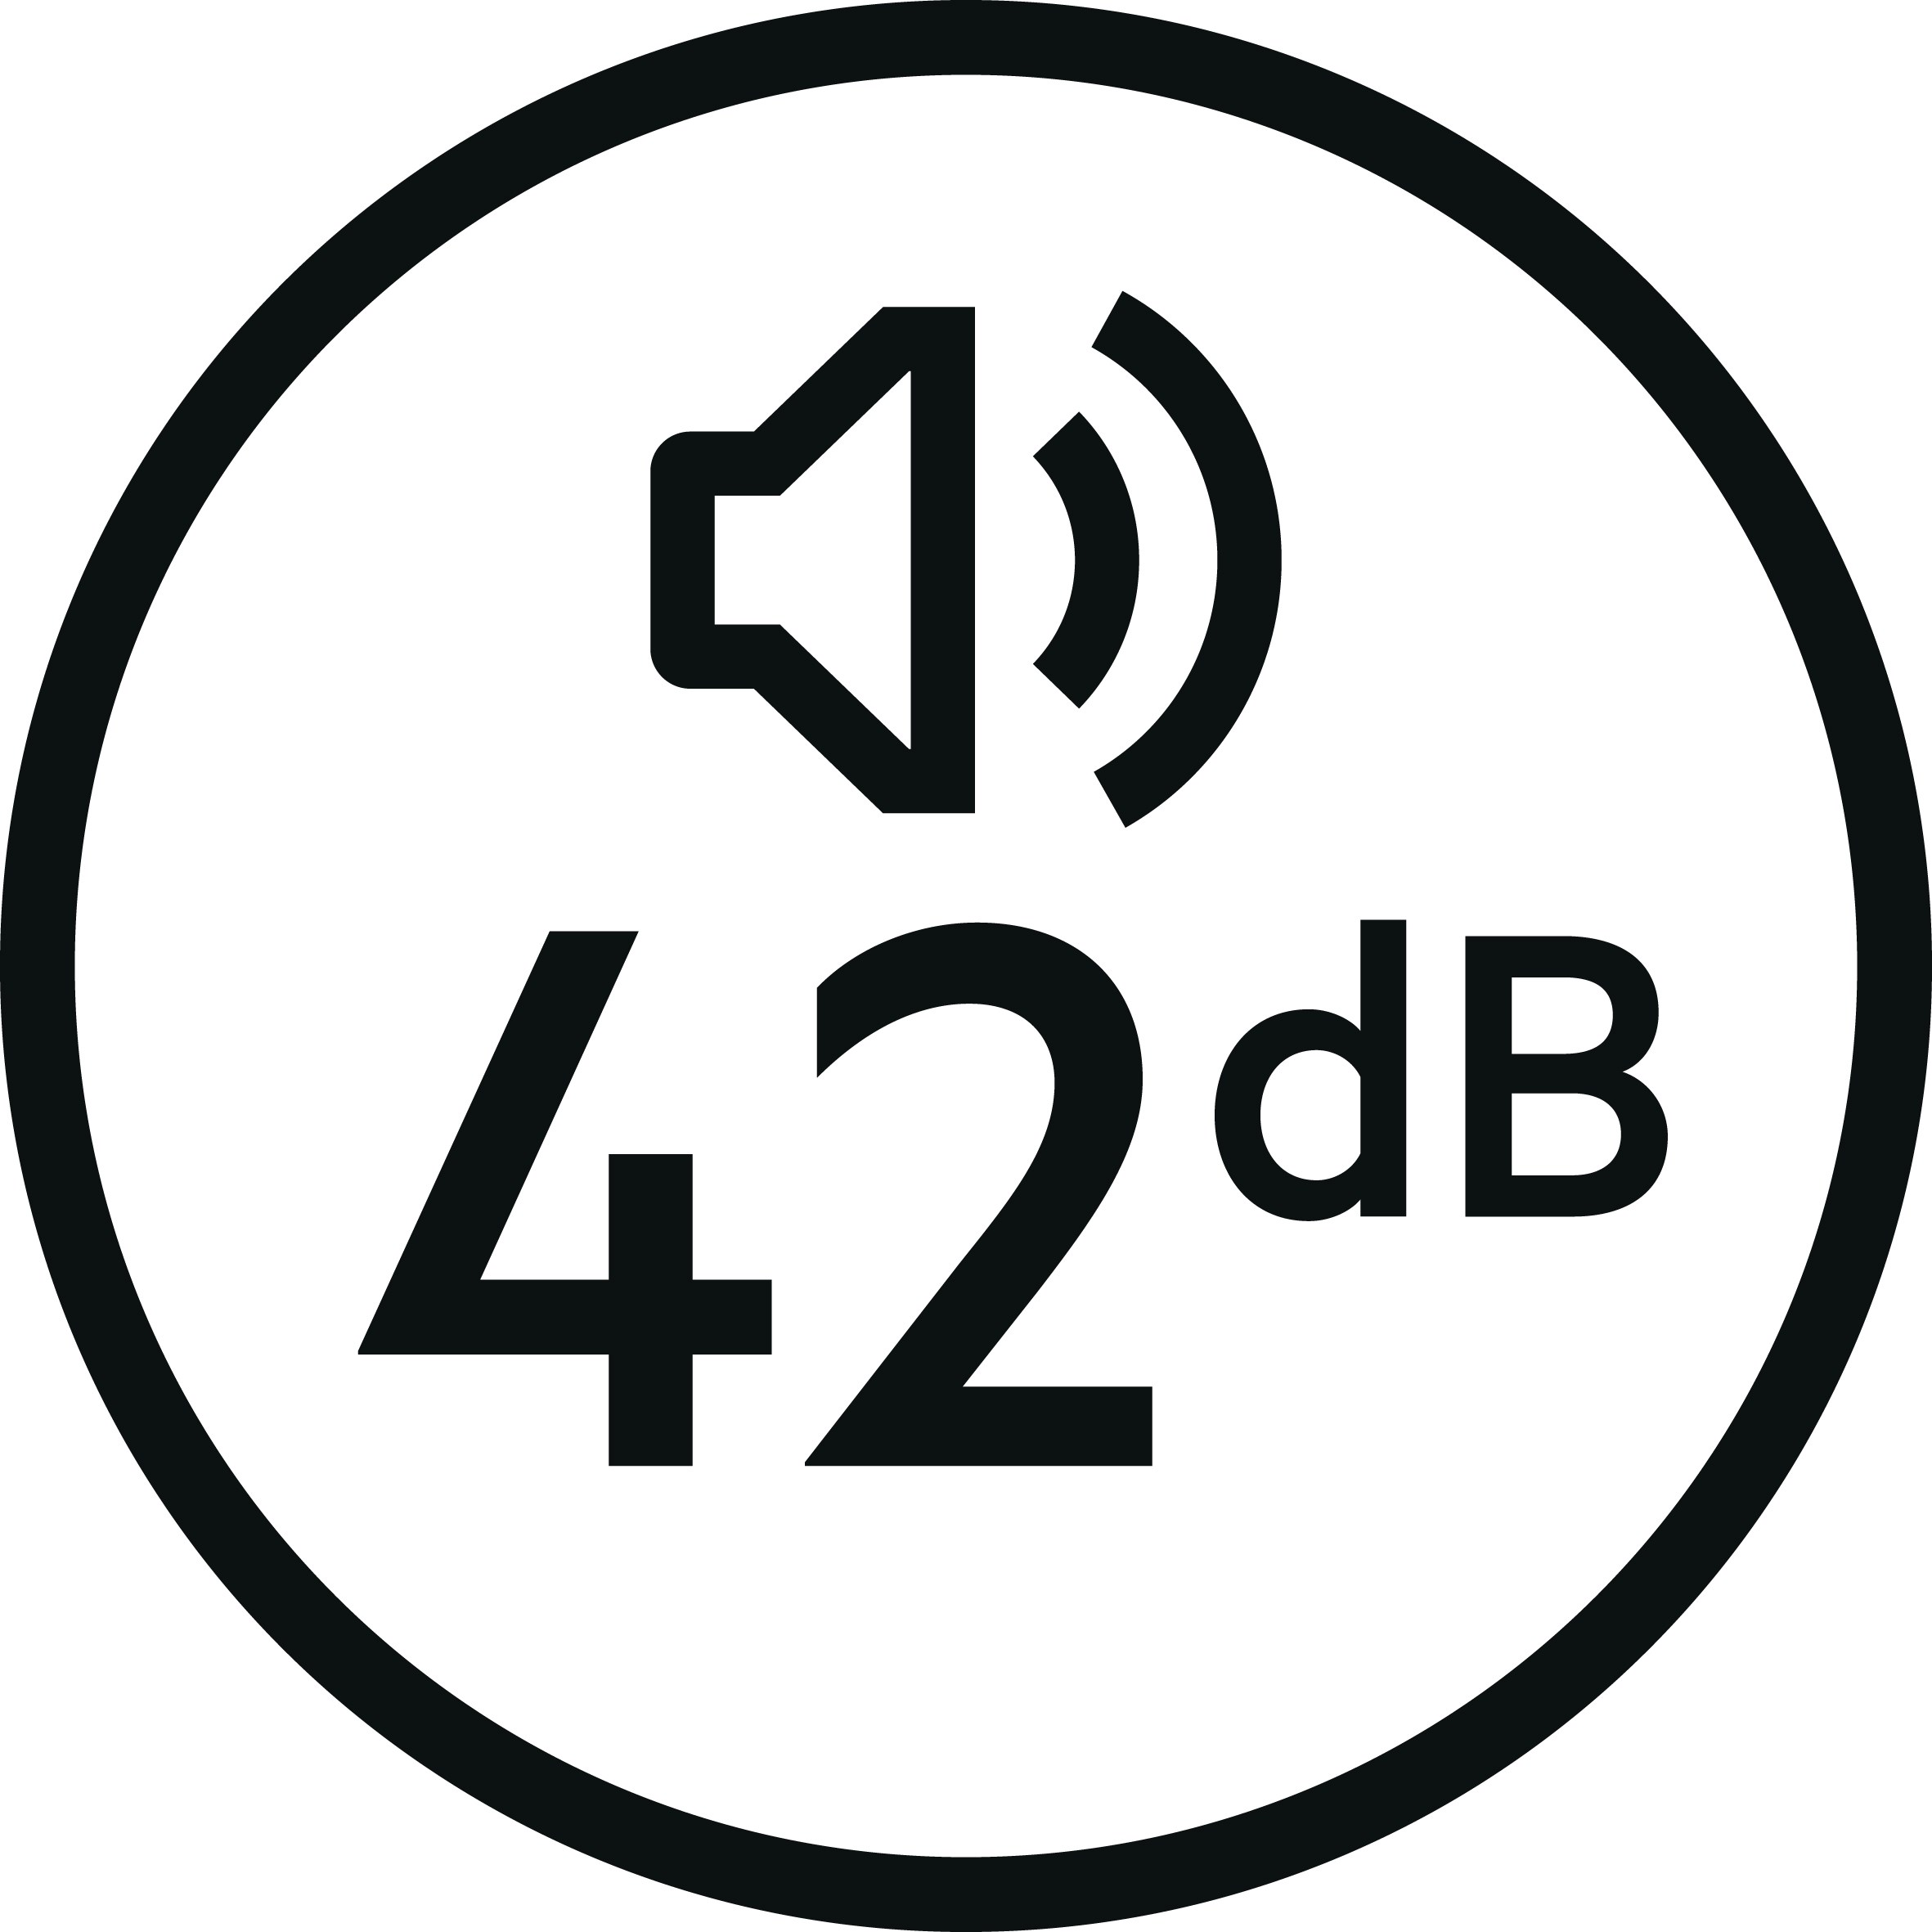 42dB-PSAAAP16PC569049.jpg